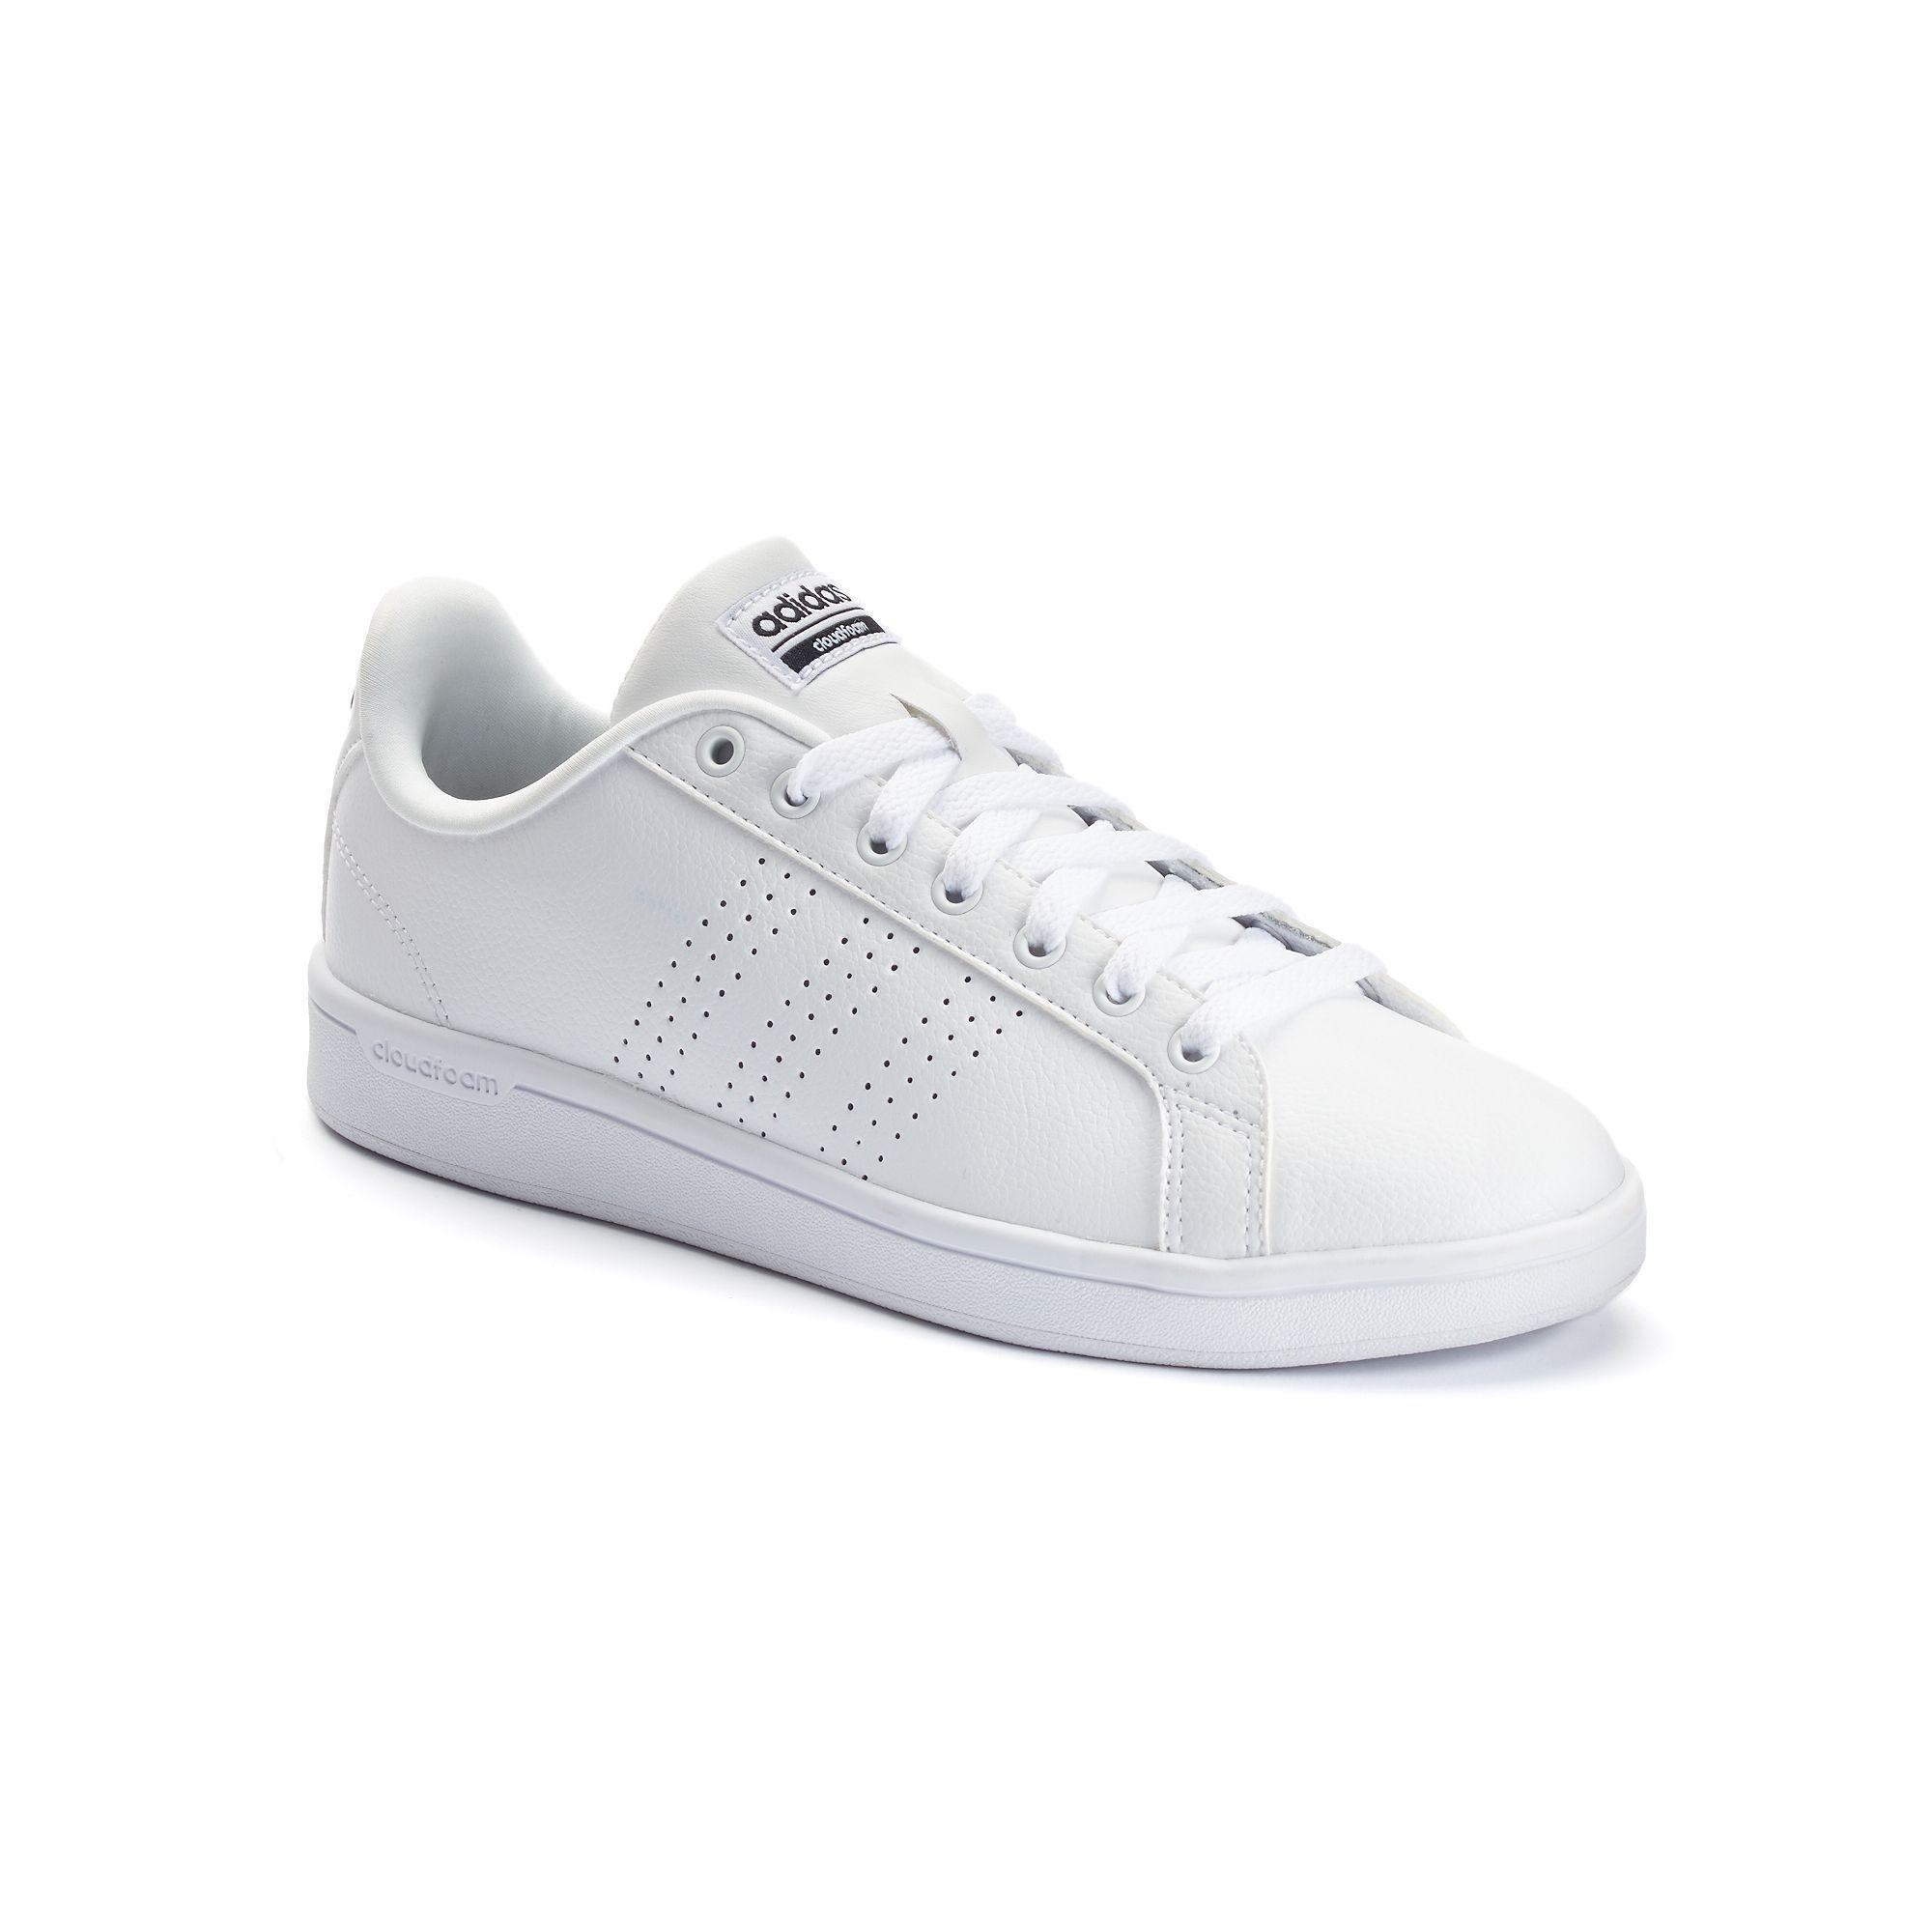 7fa3abbfee adidas Cloudfoam Advantage Clean Women s Shoes in 2019